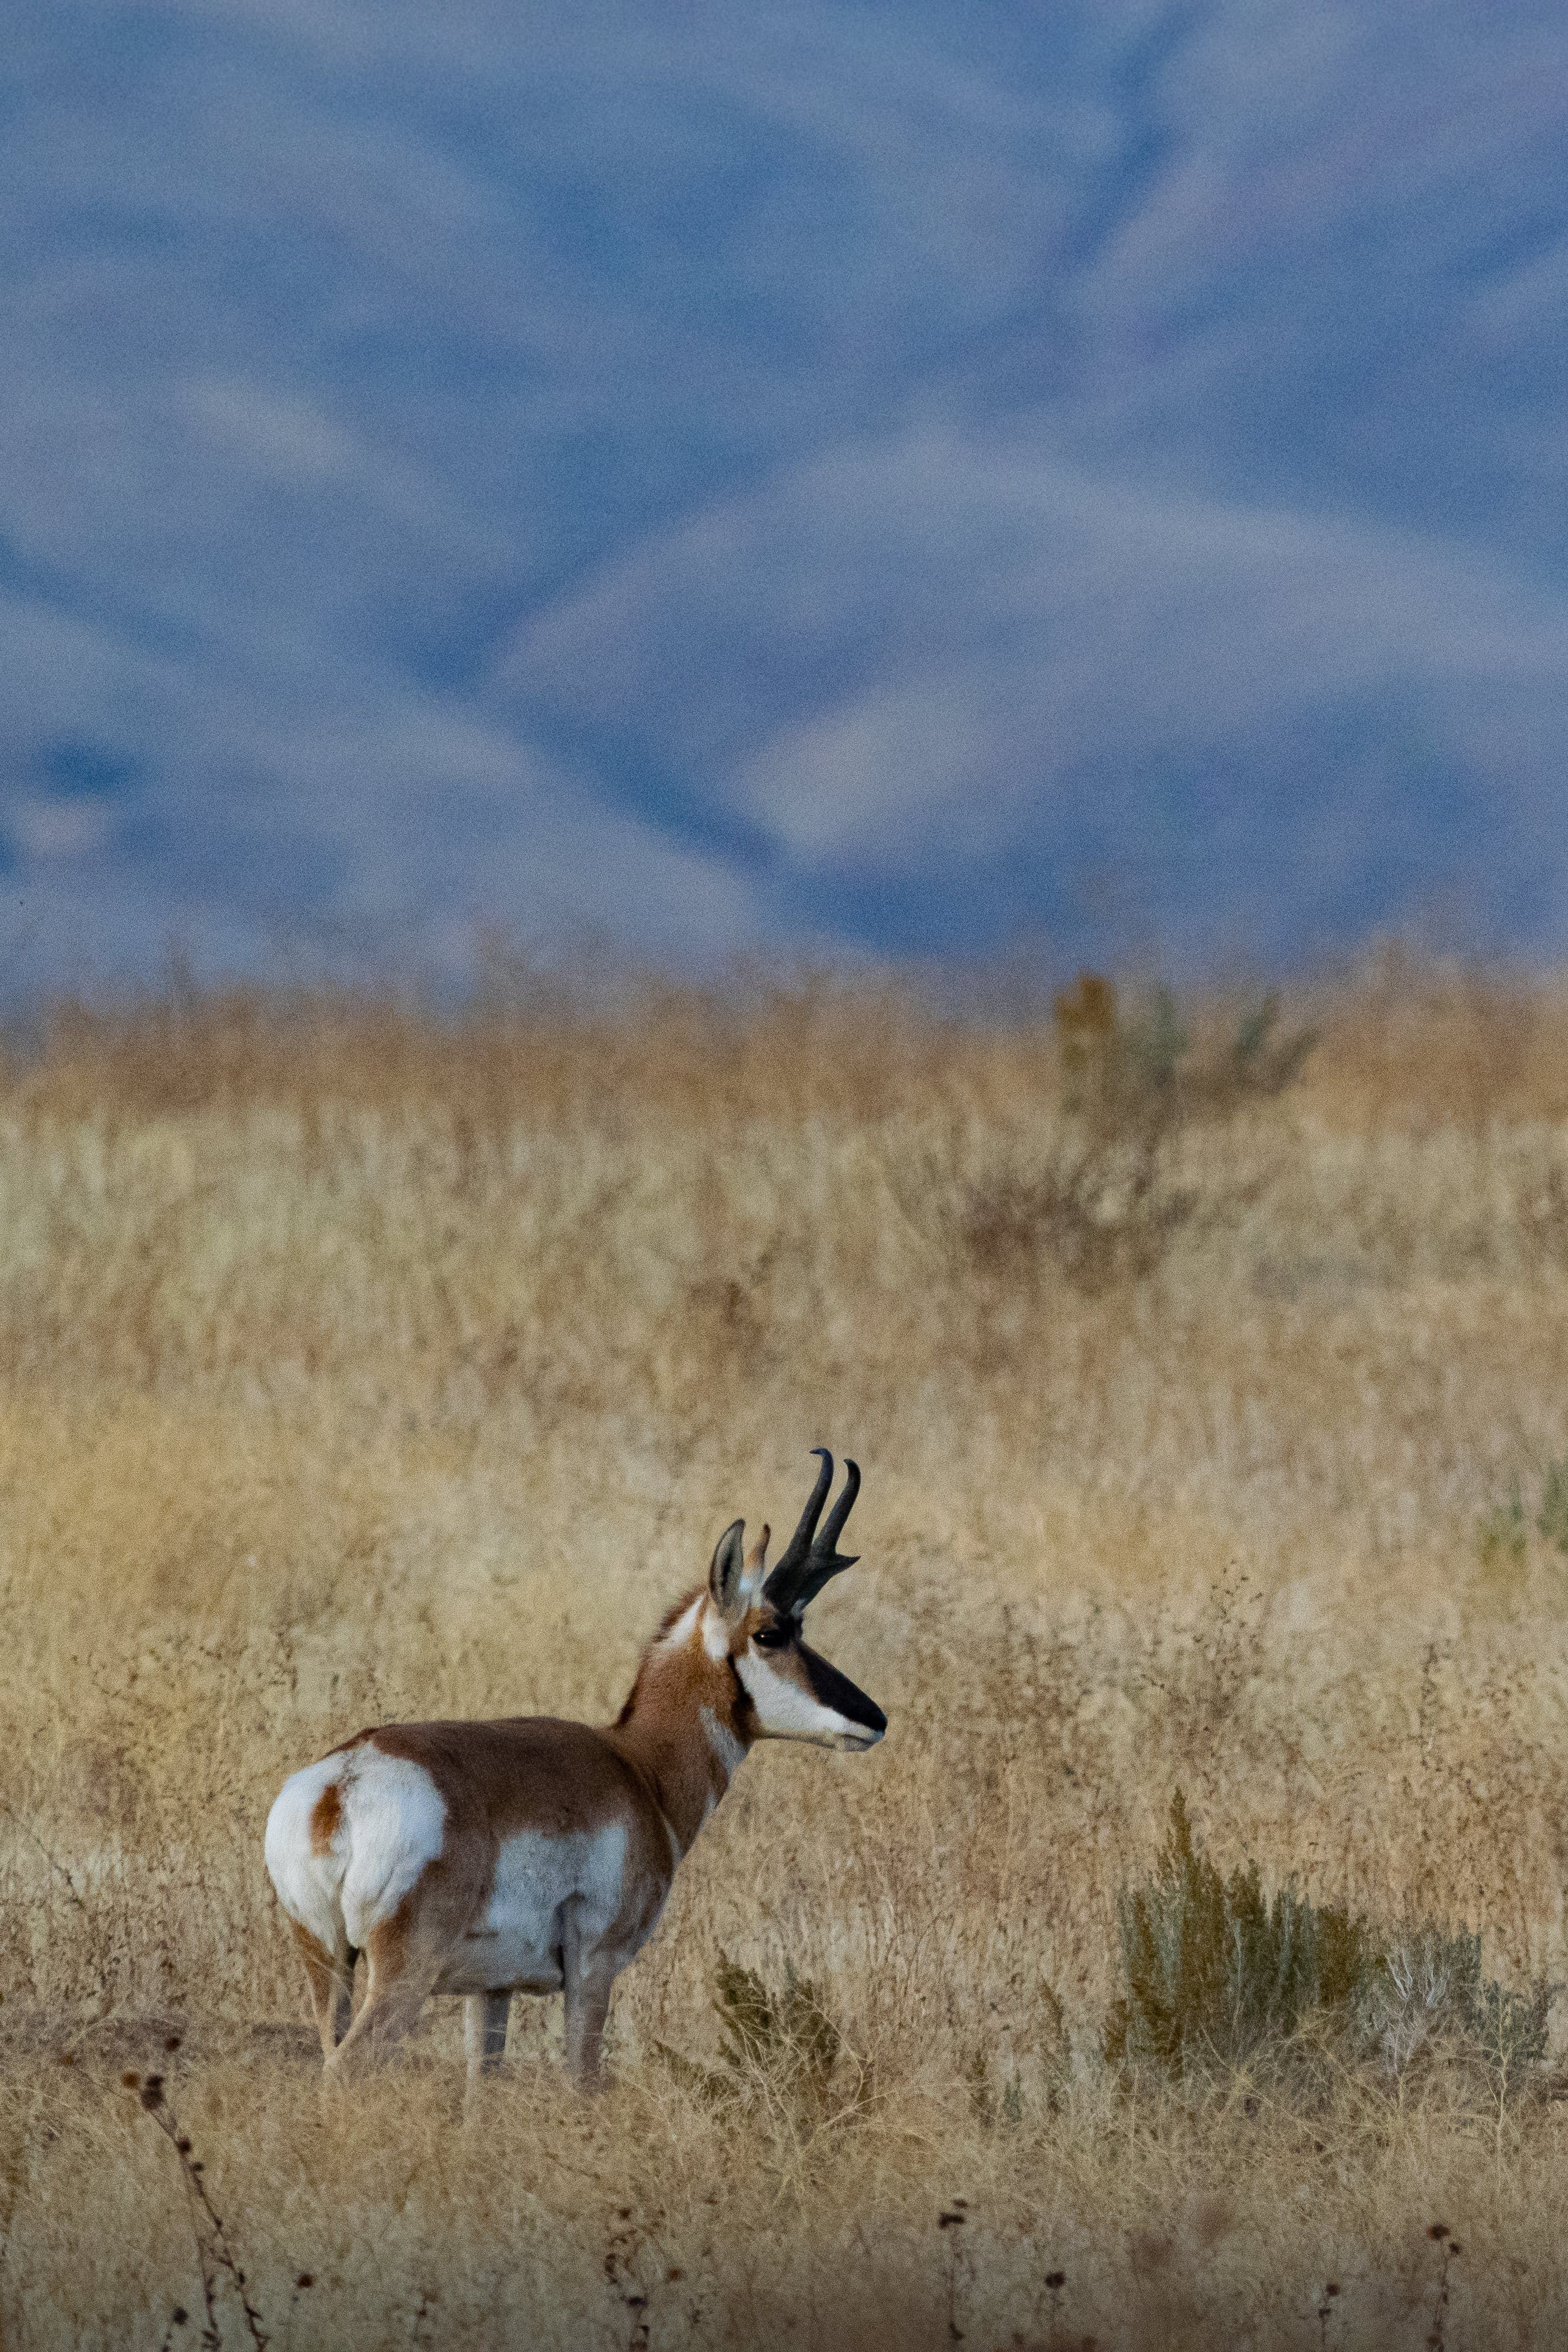 New Free Stock Photo Of Animal Wild Animal Antelope Animals Wild Animal Photography Dogs Animal Photo